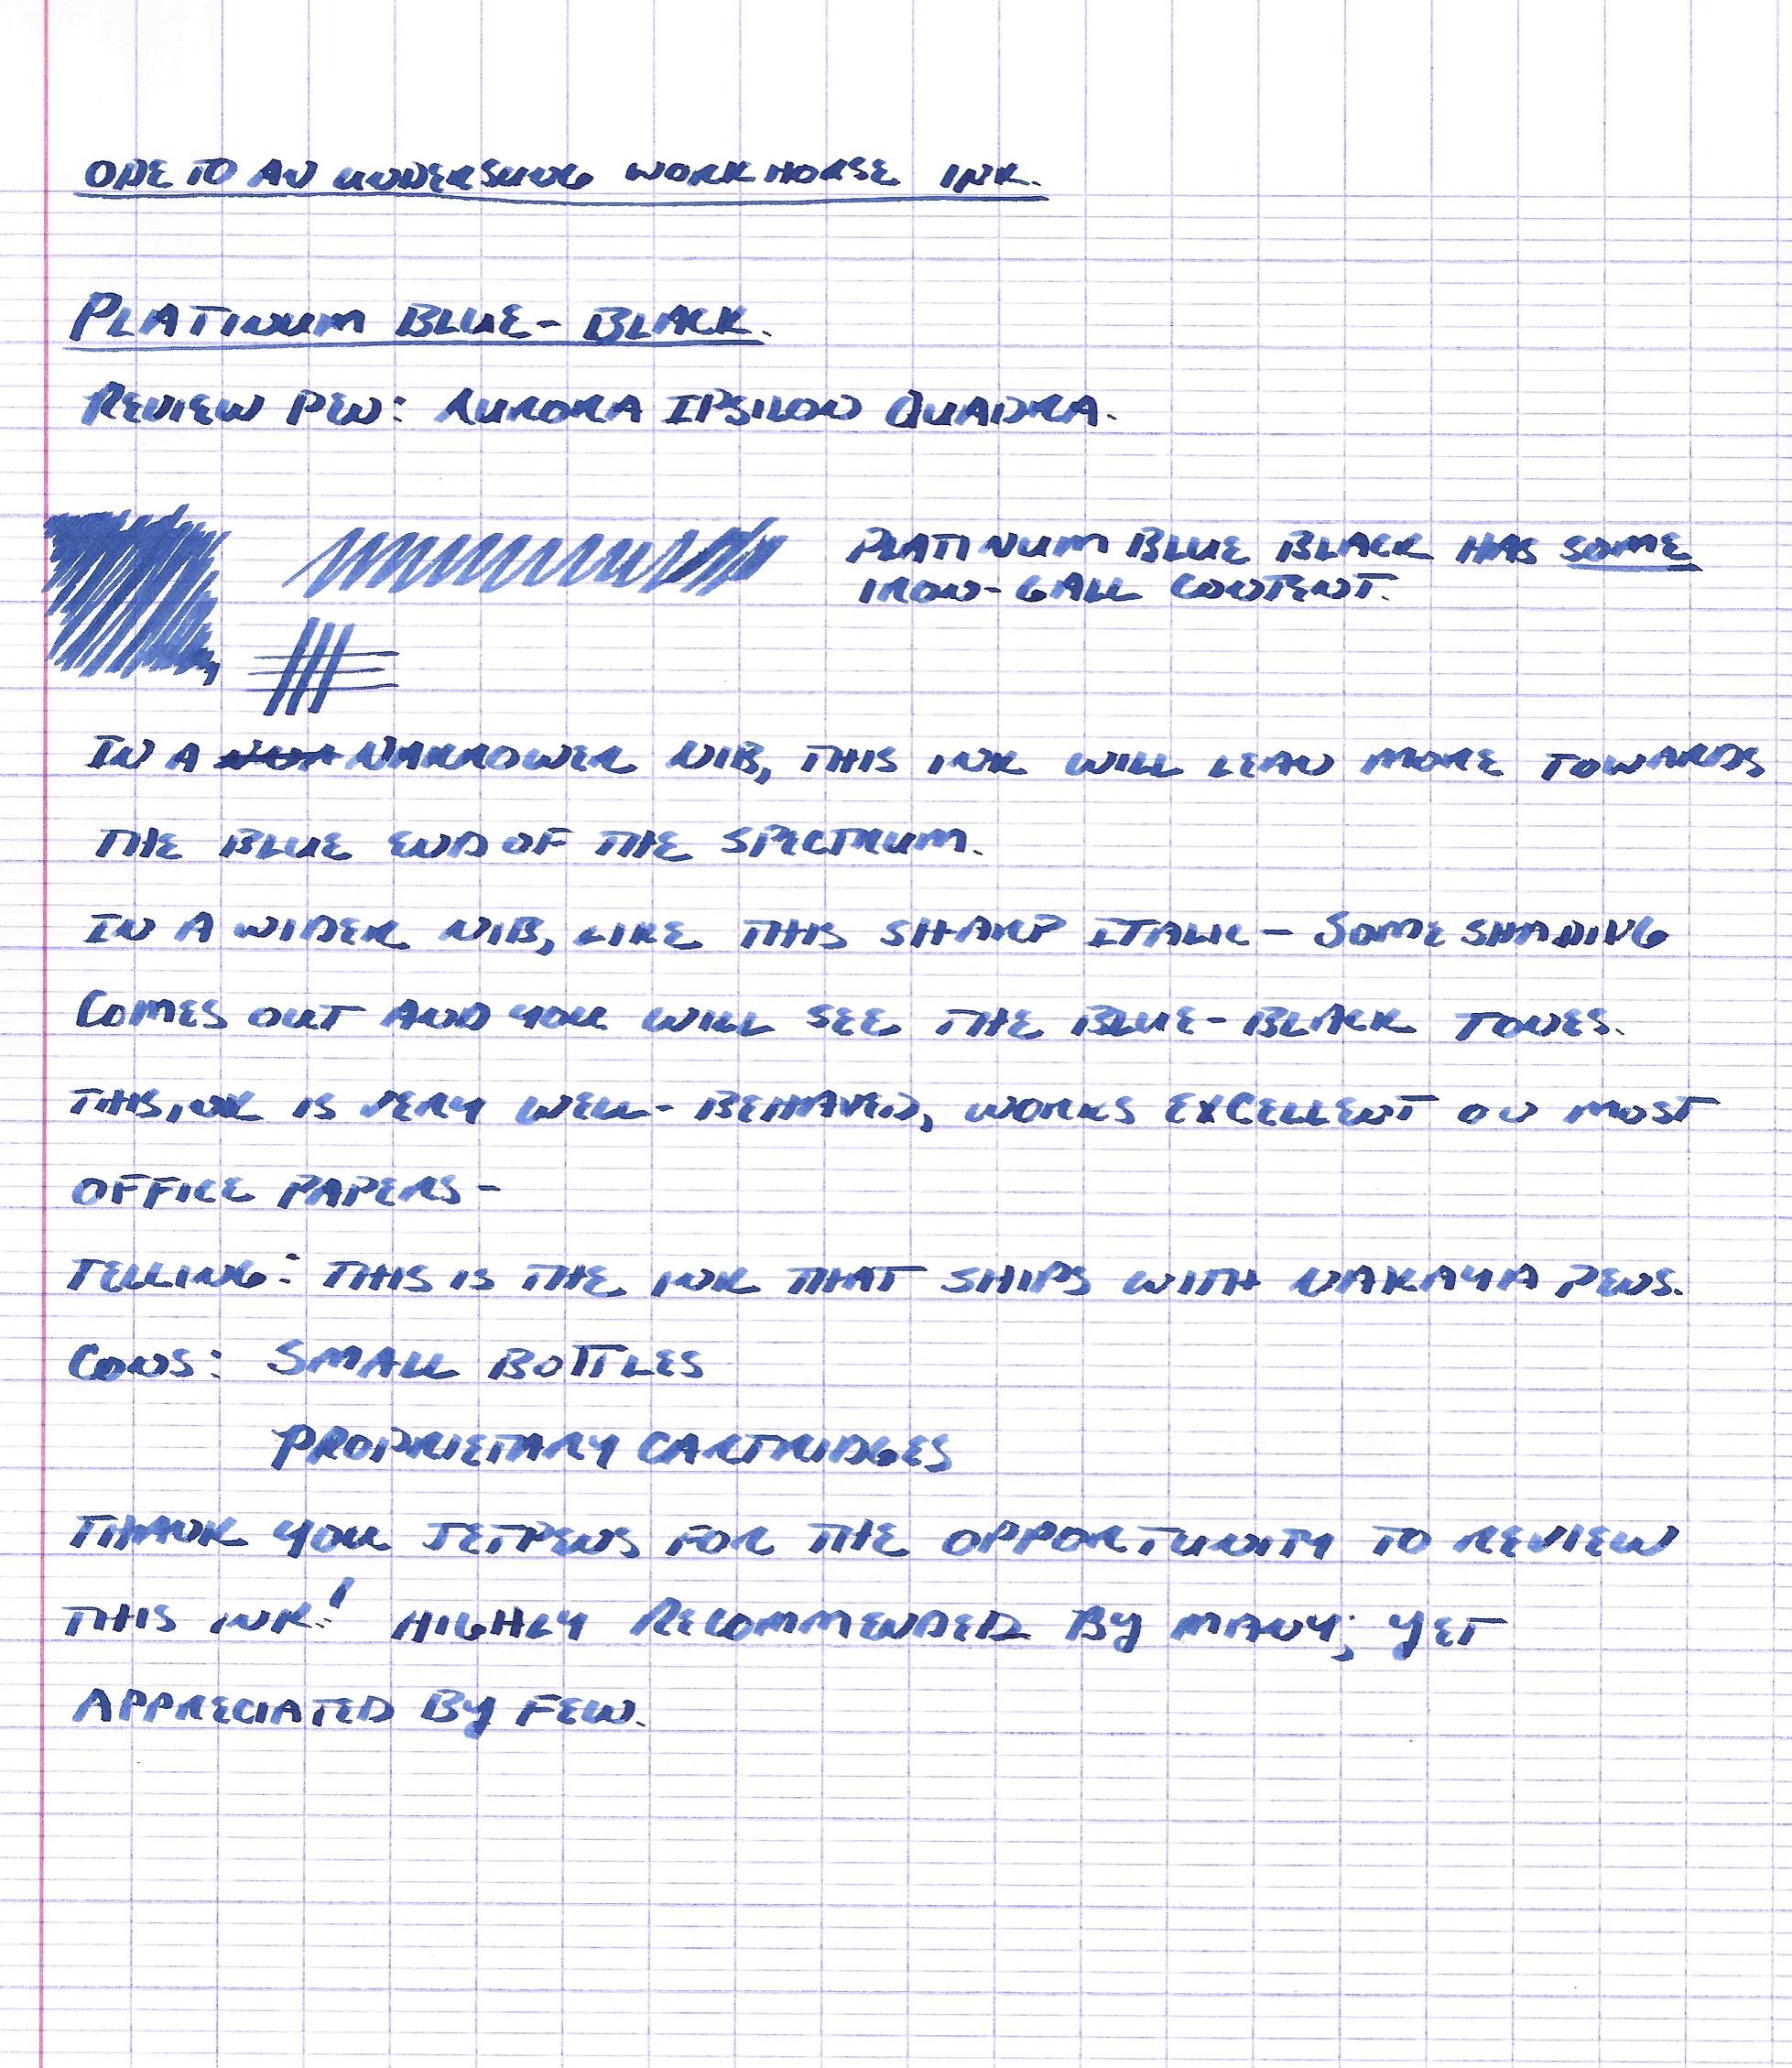 Handwritten review with Aurora Ipsilon Quadra fountain pen, stub nib.